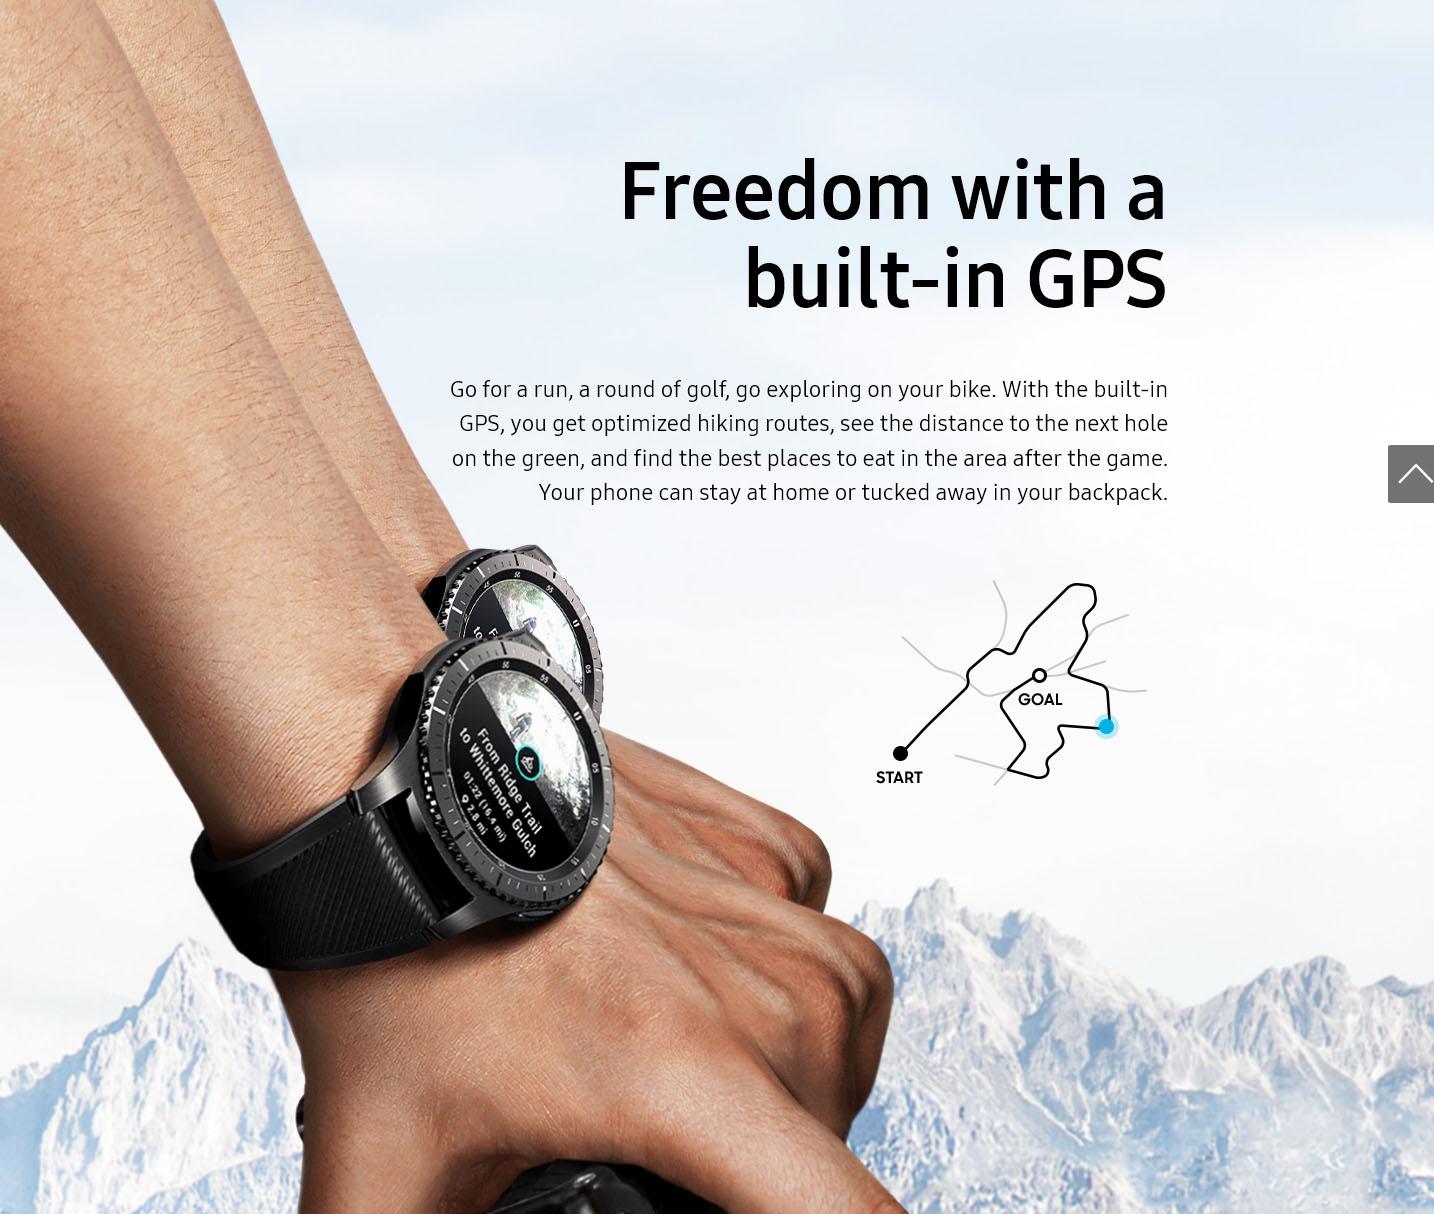 Details about Samsung Gear S3 Sm-R760 Frontier Bluetooth Smart Watch AU  Stock Warranty Black